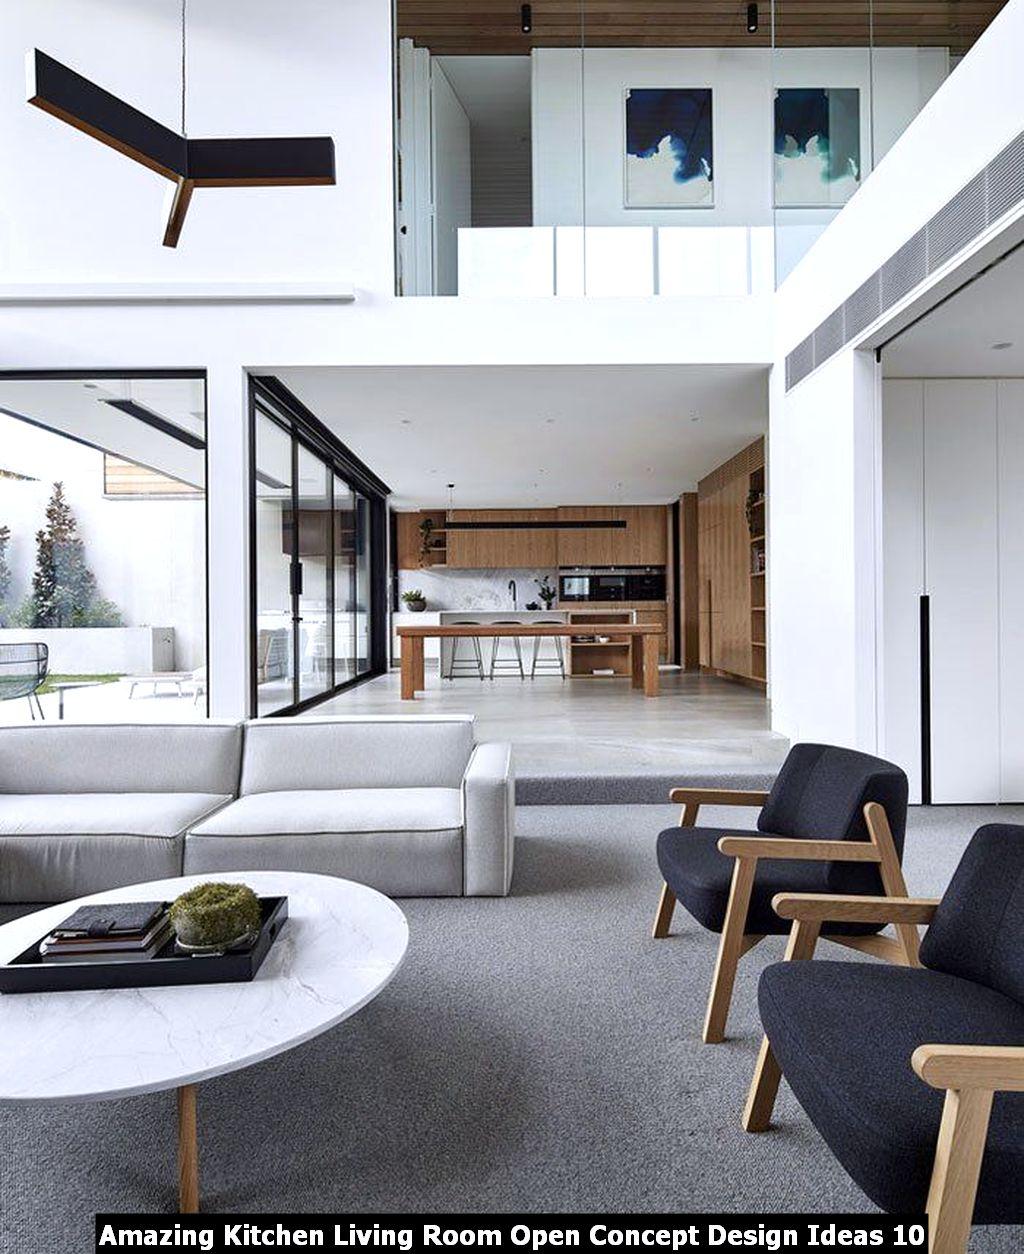 Amazing Kitchen Living Room Open Concept Design Ideas 10